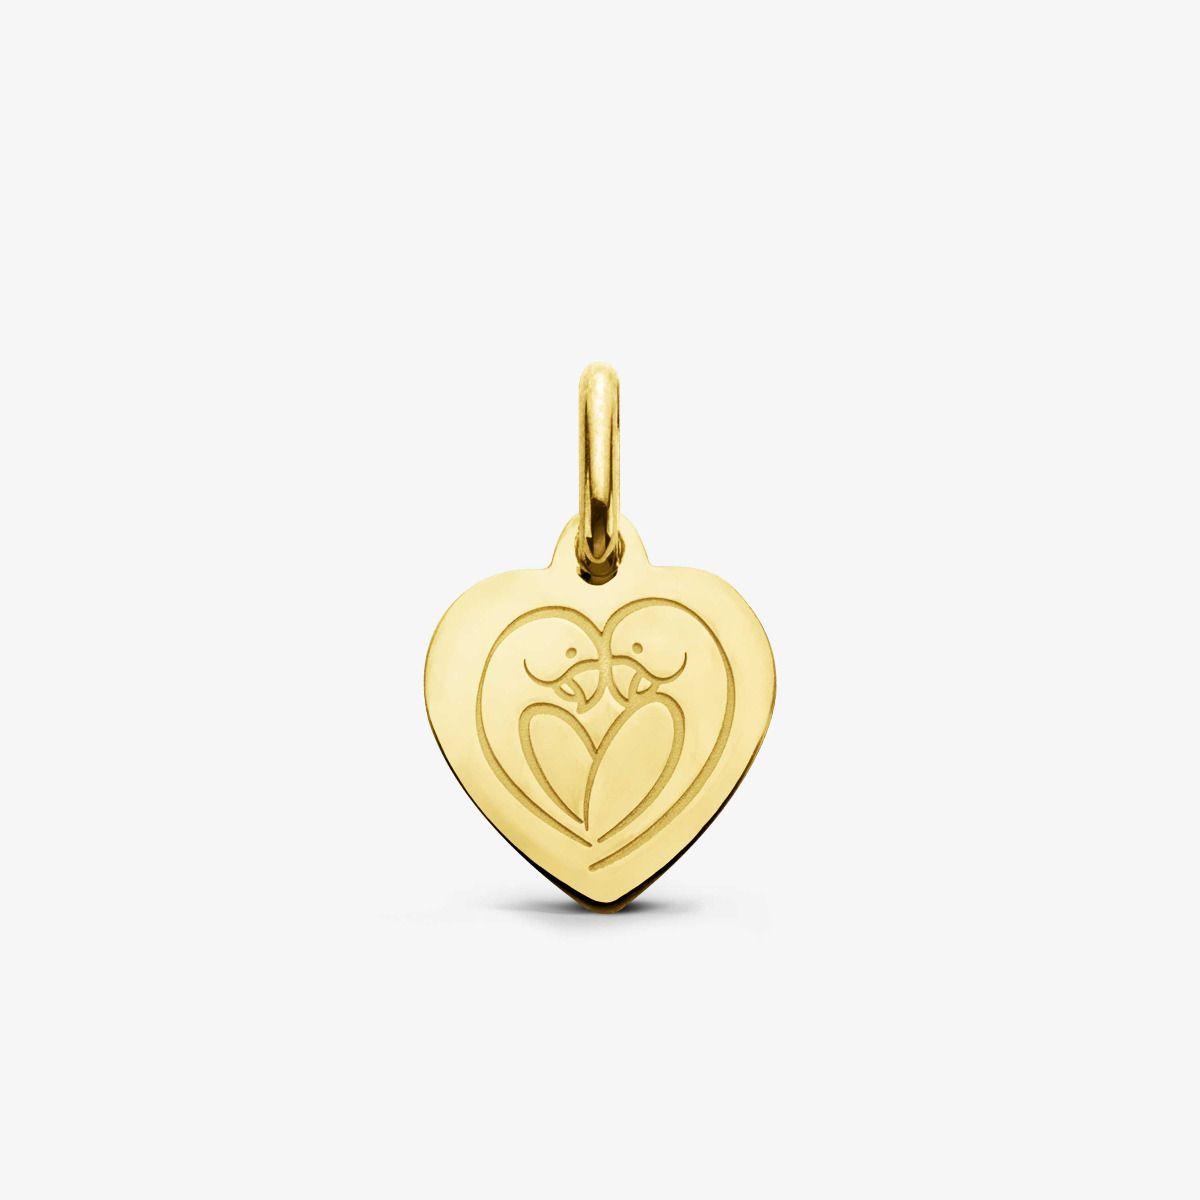 Mini Médaille Cœur Love Bird Or Jaune 18 carats - 10,5 mm